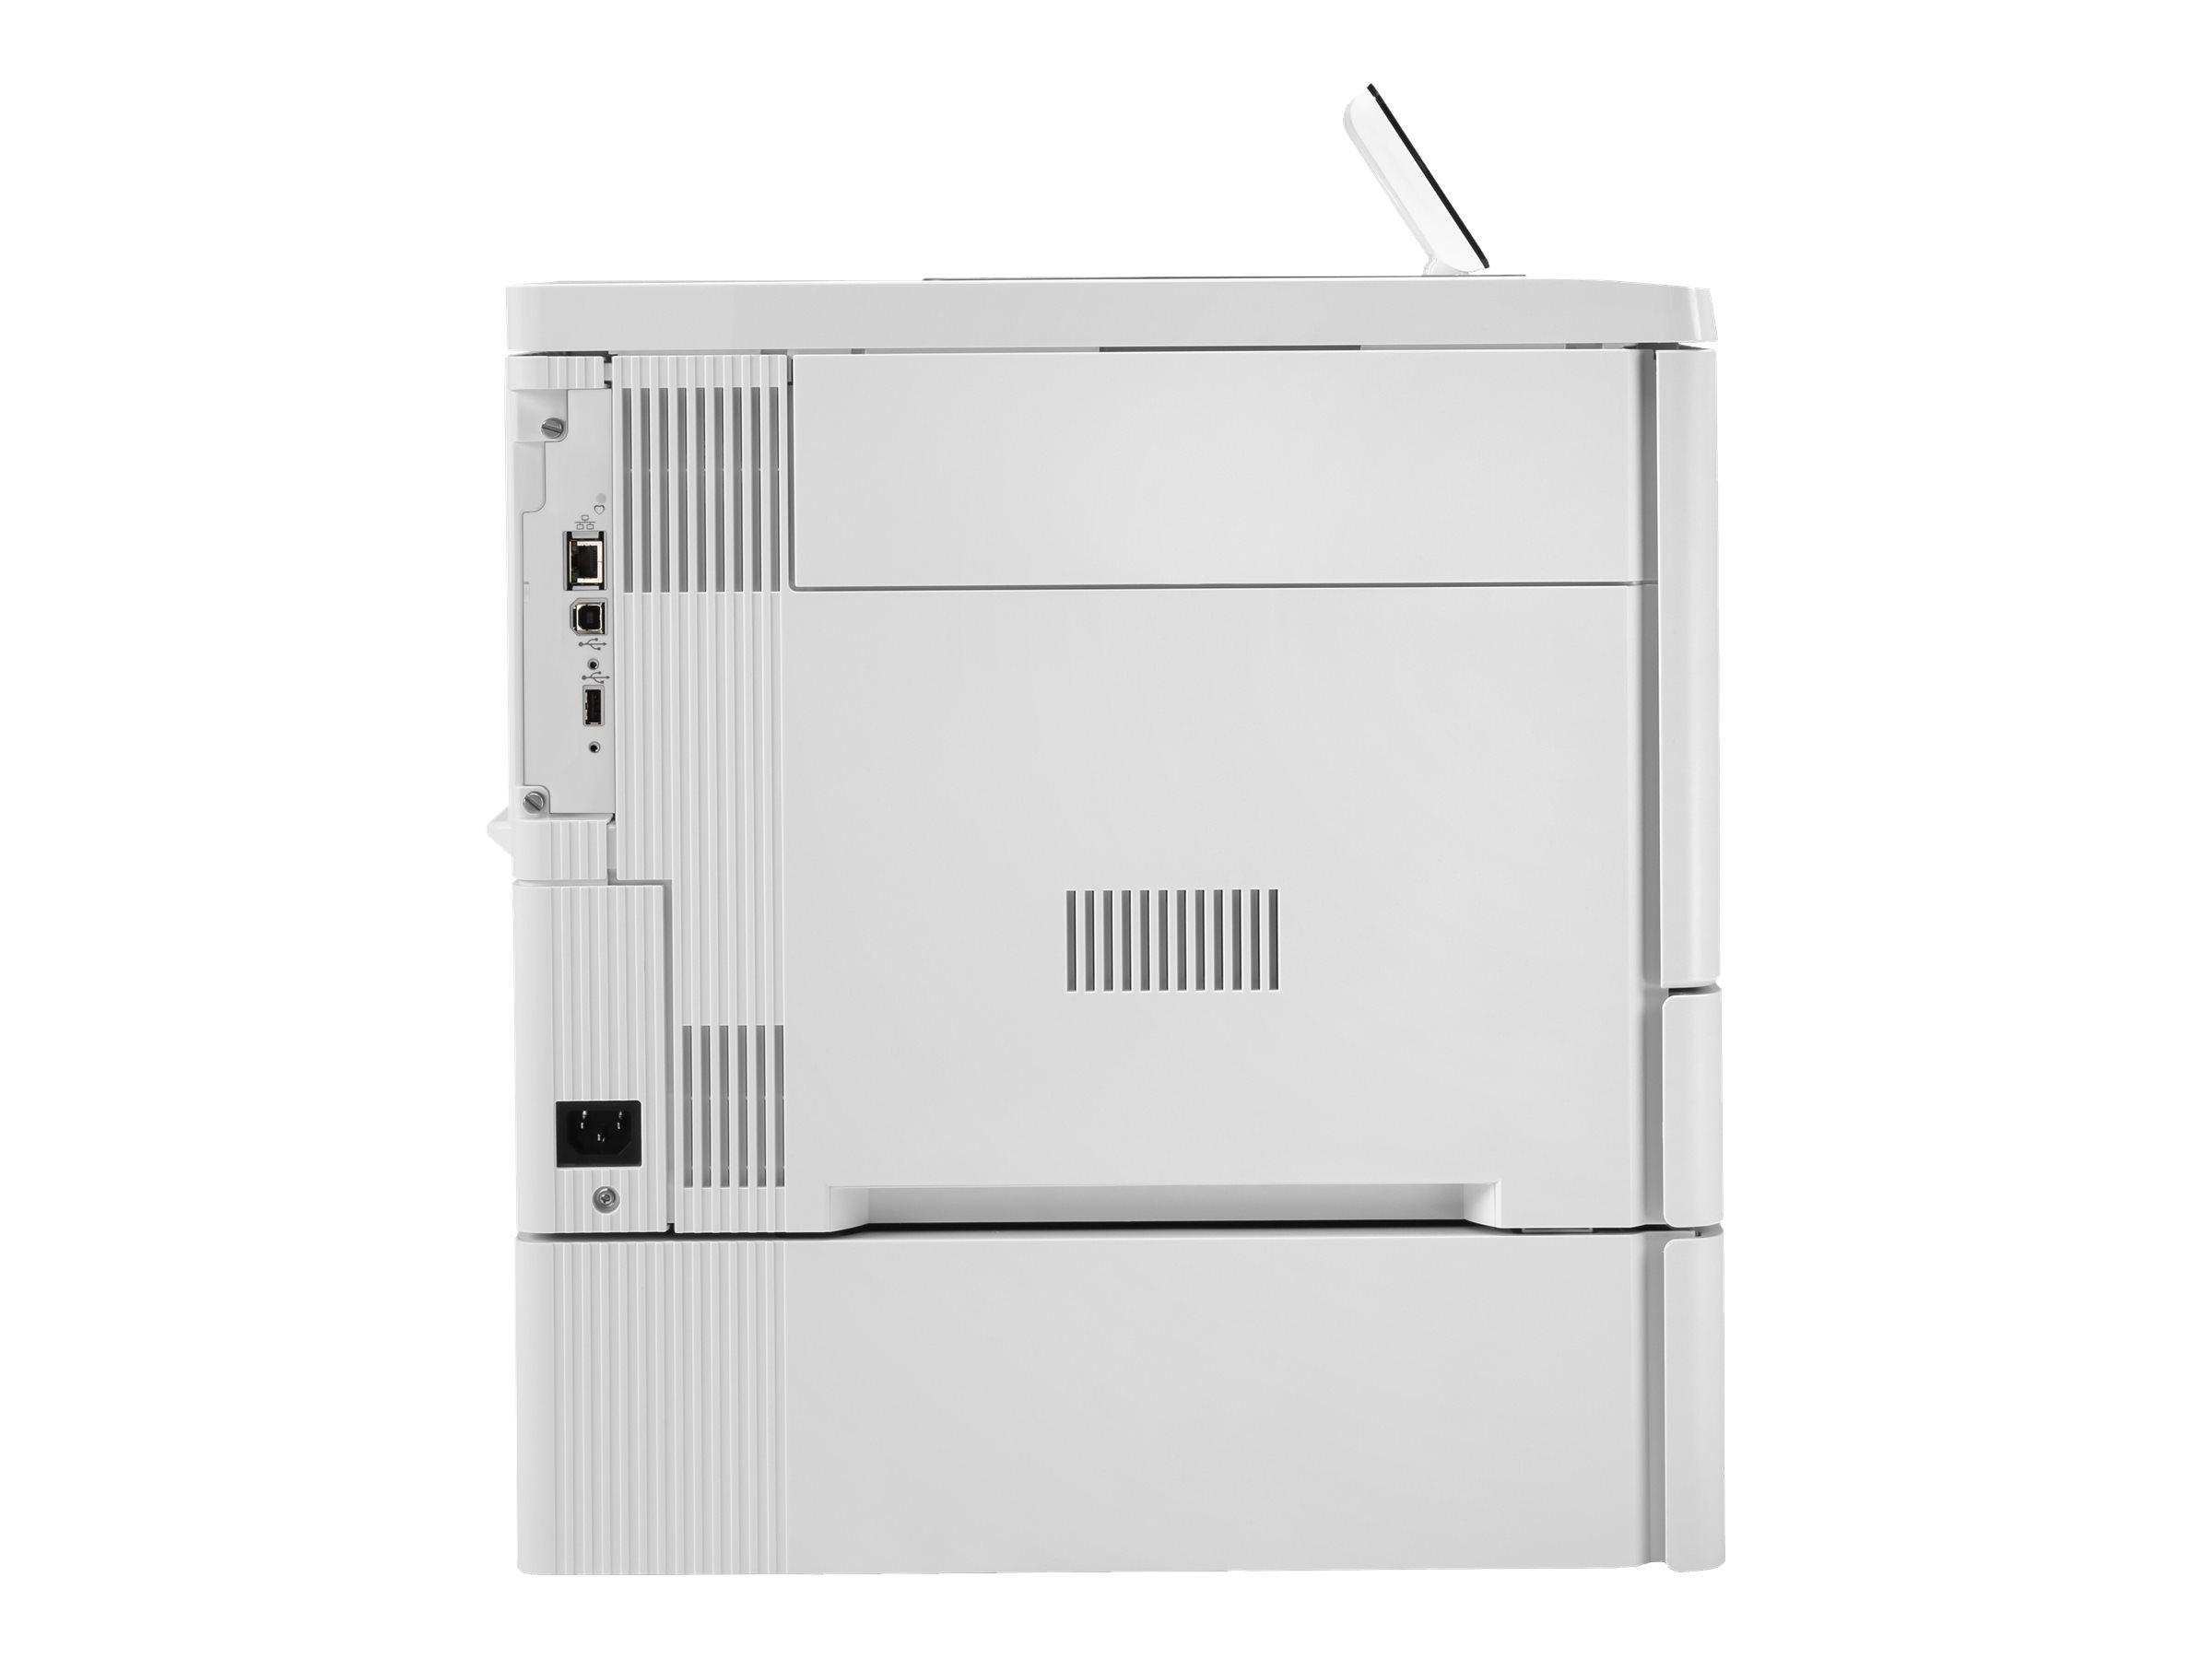 HP Color LaserJet Enterprise M555x - printer - color - laser